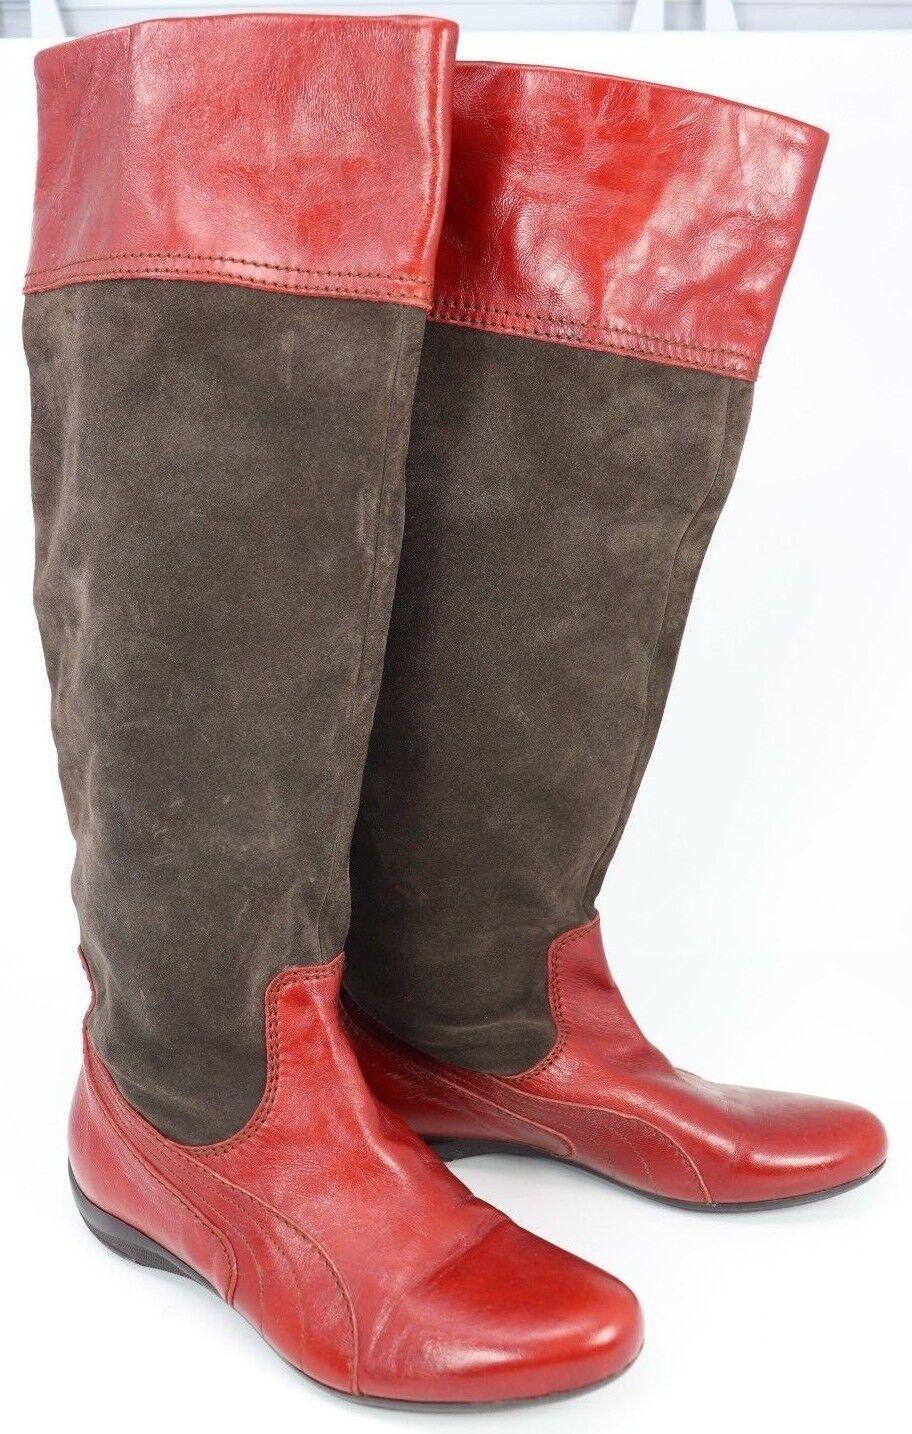 Puma Womens Boots Knee Hi 96 Hours Speedcat ReLuxe Size 9.5